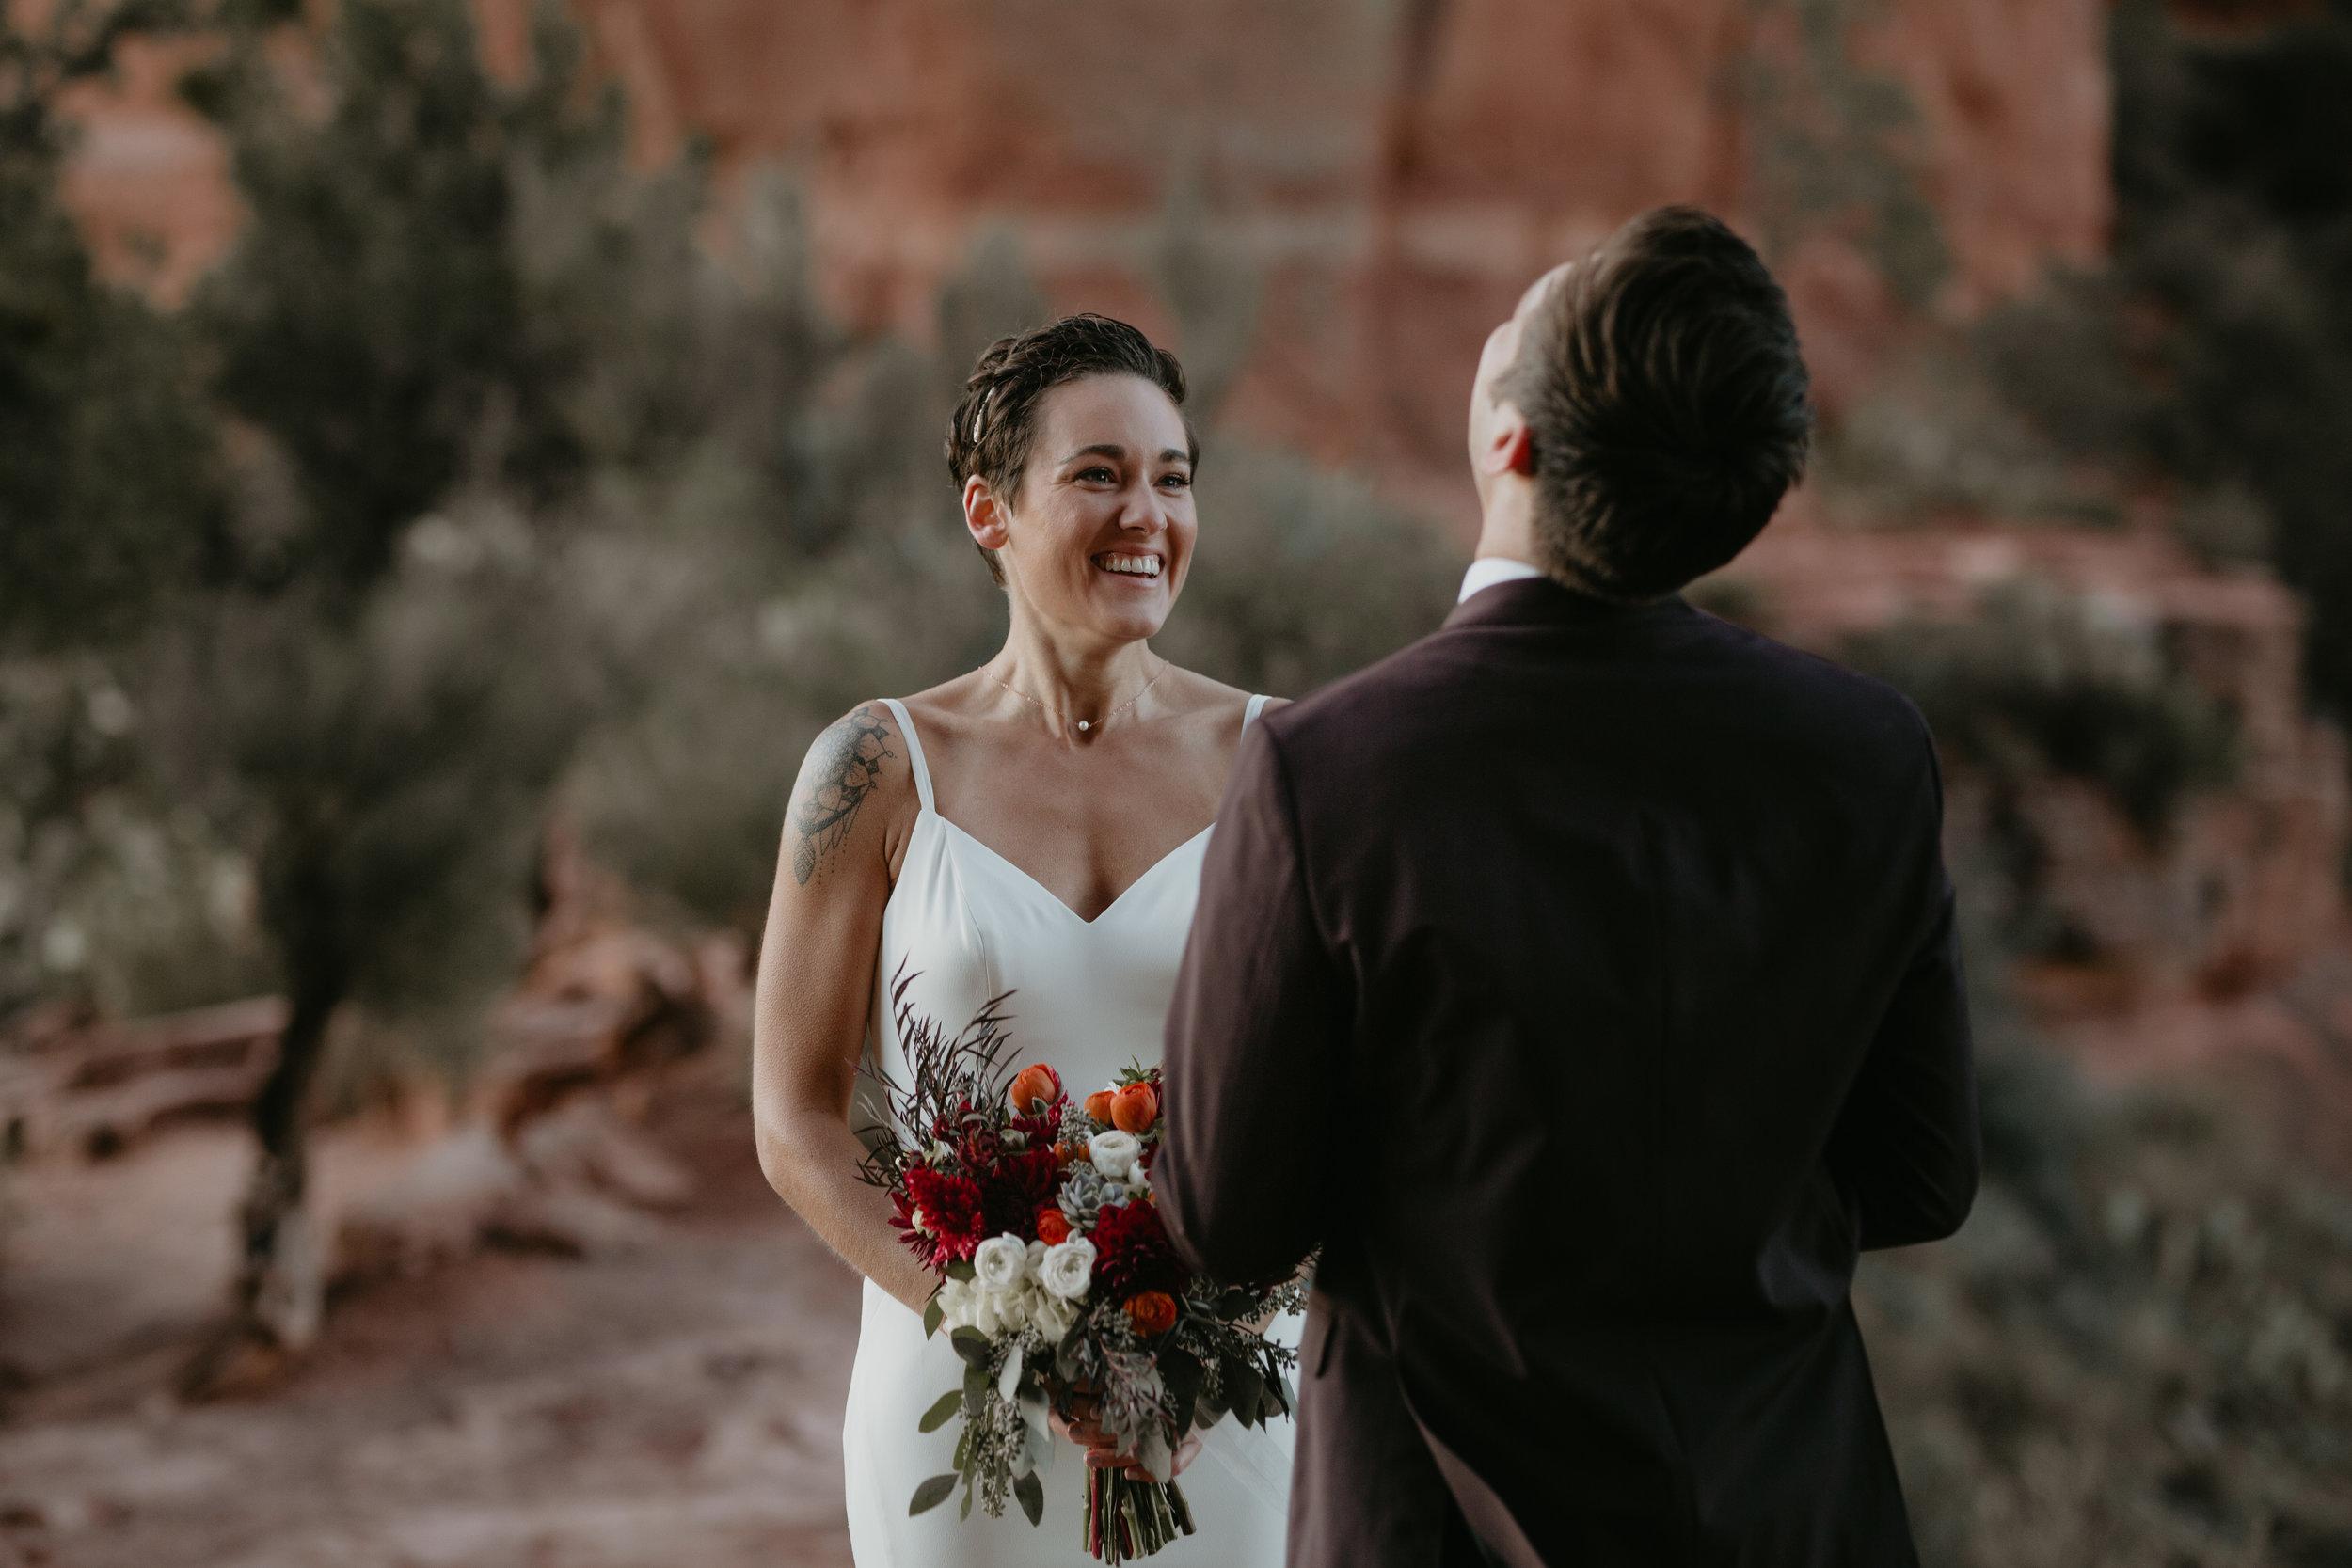 nicole-daacke-photography-sedona-arizona-destination-elopement-wedding-photographer-catherdral-rock-hiking-elopement-sedona-river-elopement-photos-desert-rock-wedding-photographer-laid-back-spontaneous-elopement-33.jpg